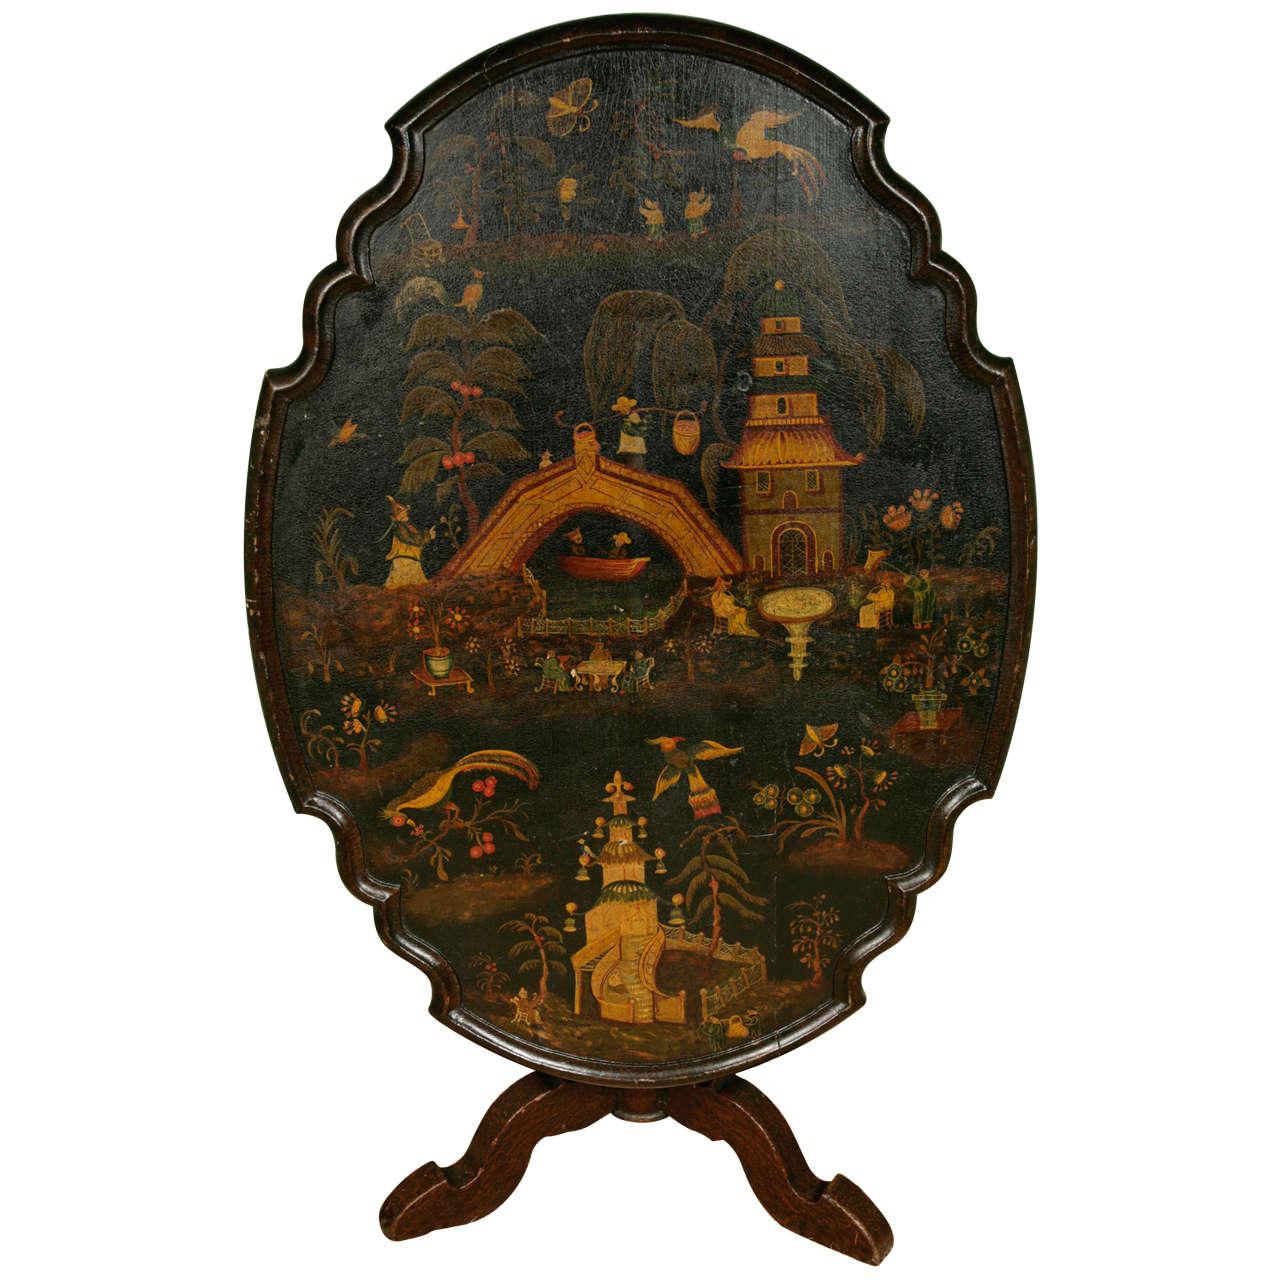 High Quality A U0027Dutchu0027 18th Century Chinoiserie Tilt Top Table 1